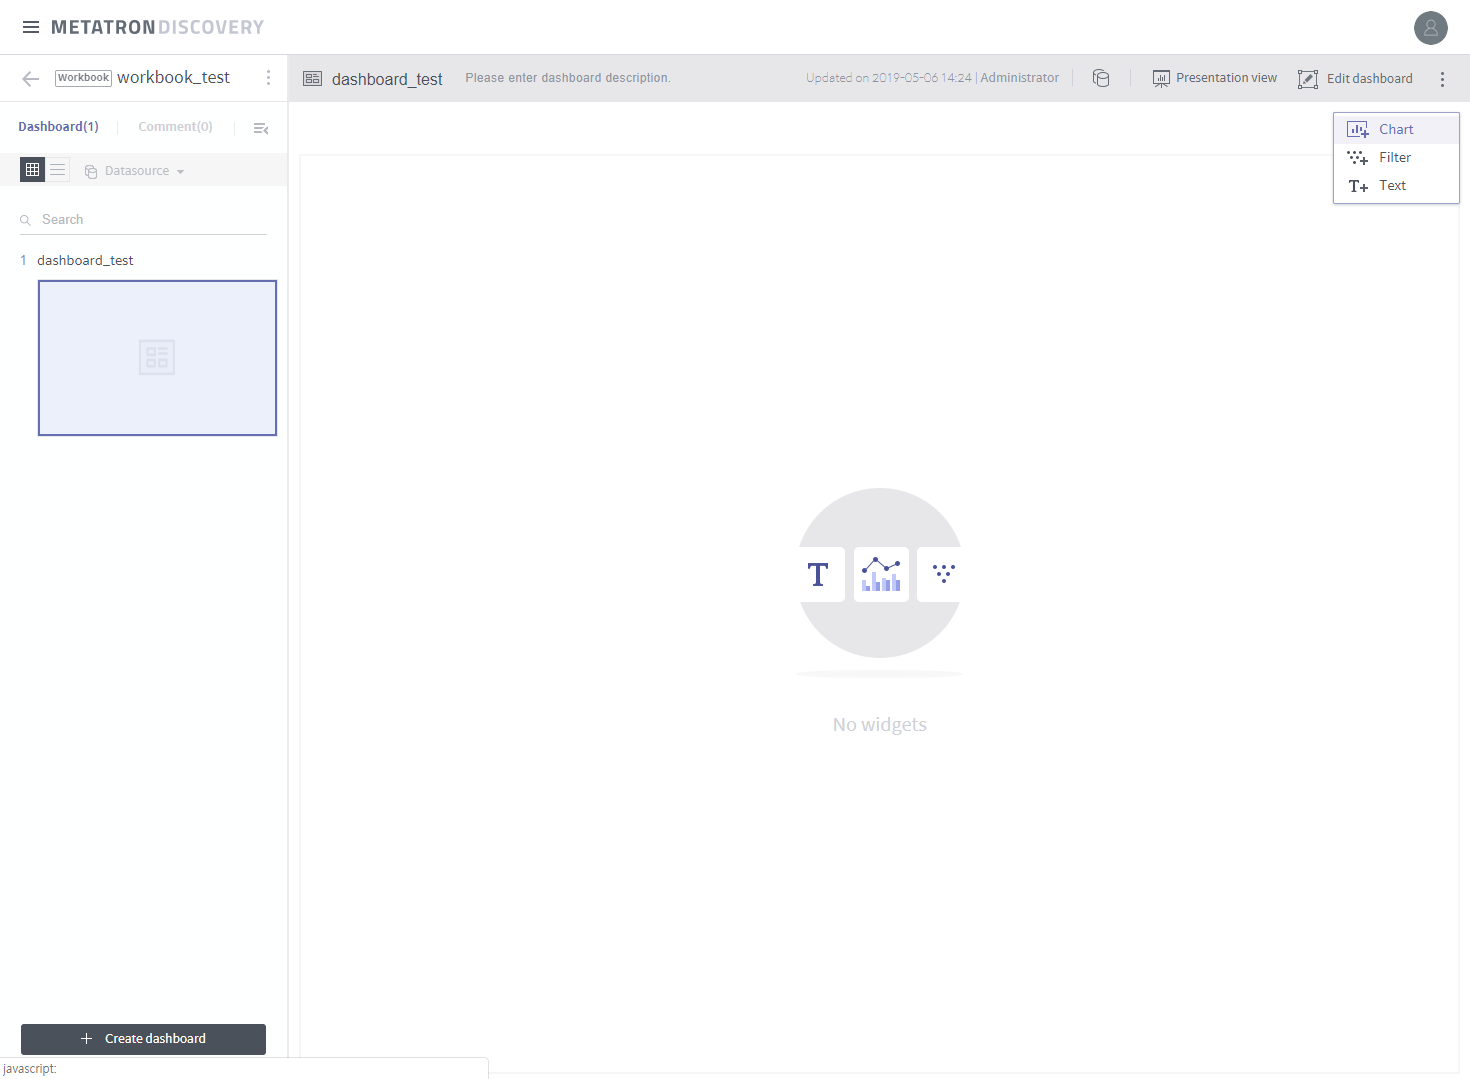 Step 3. Organize a dashboard — metatron discovery docs 0.4.3 ...